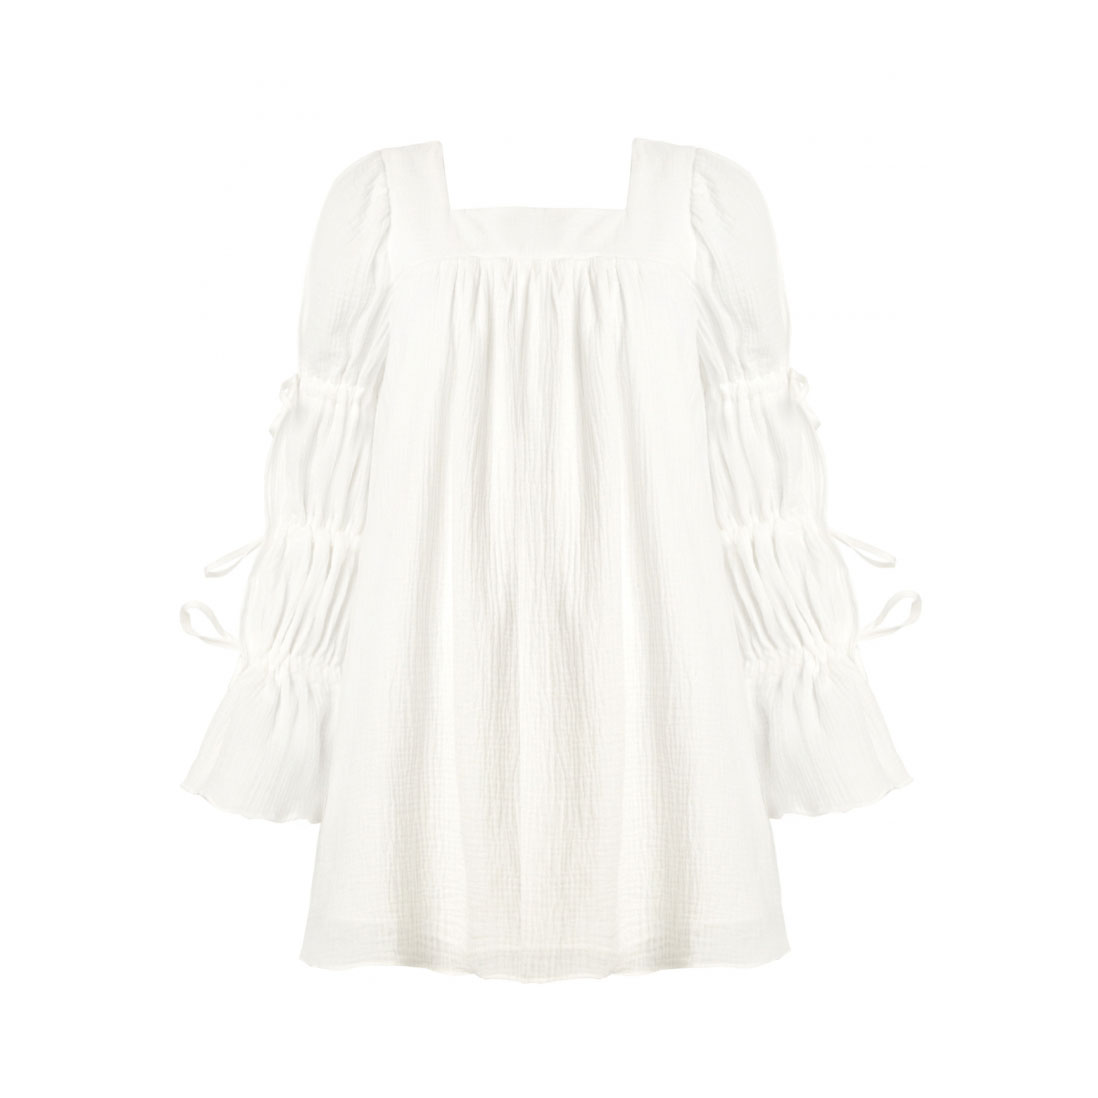 Non-Traditional Wedding Dress Alternatives